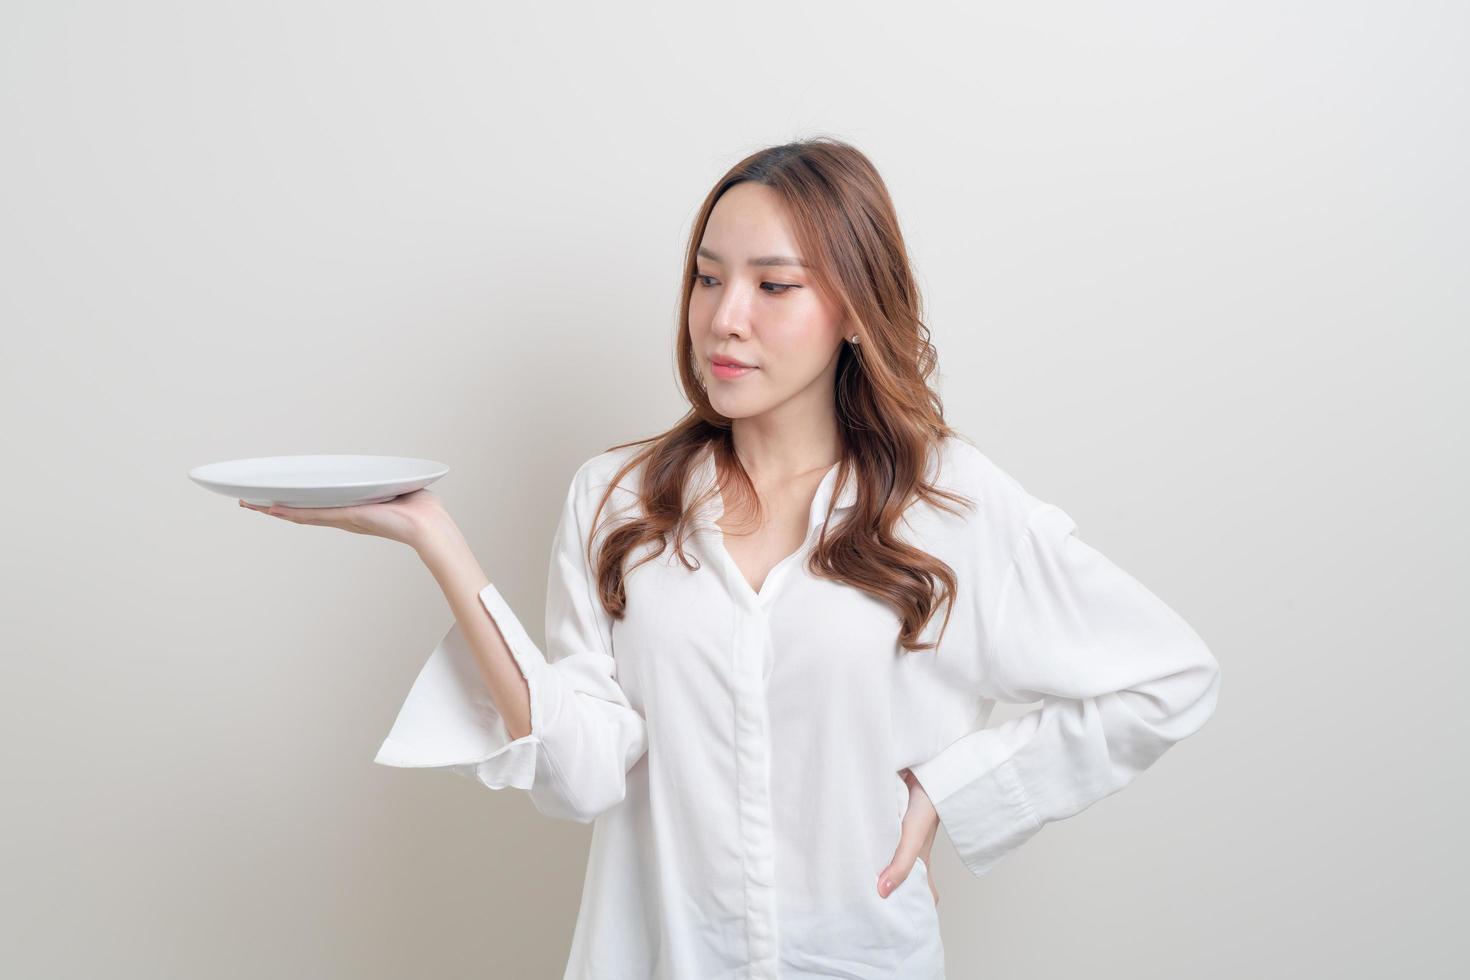 Portrait beautiful Asian woman holding empty plate photo